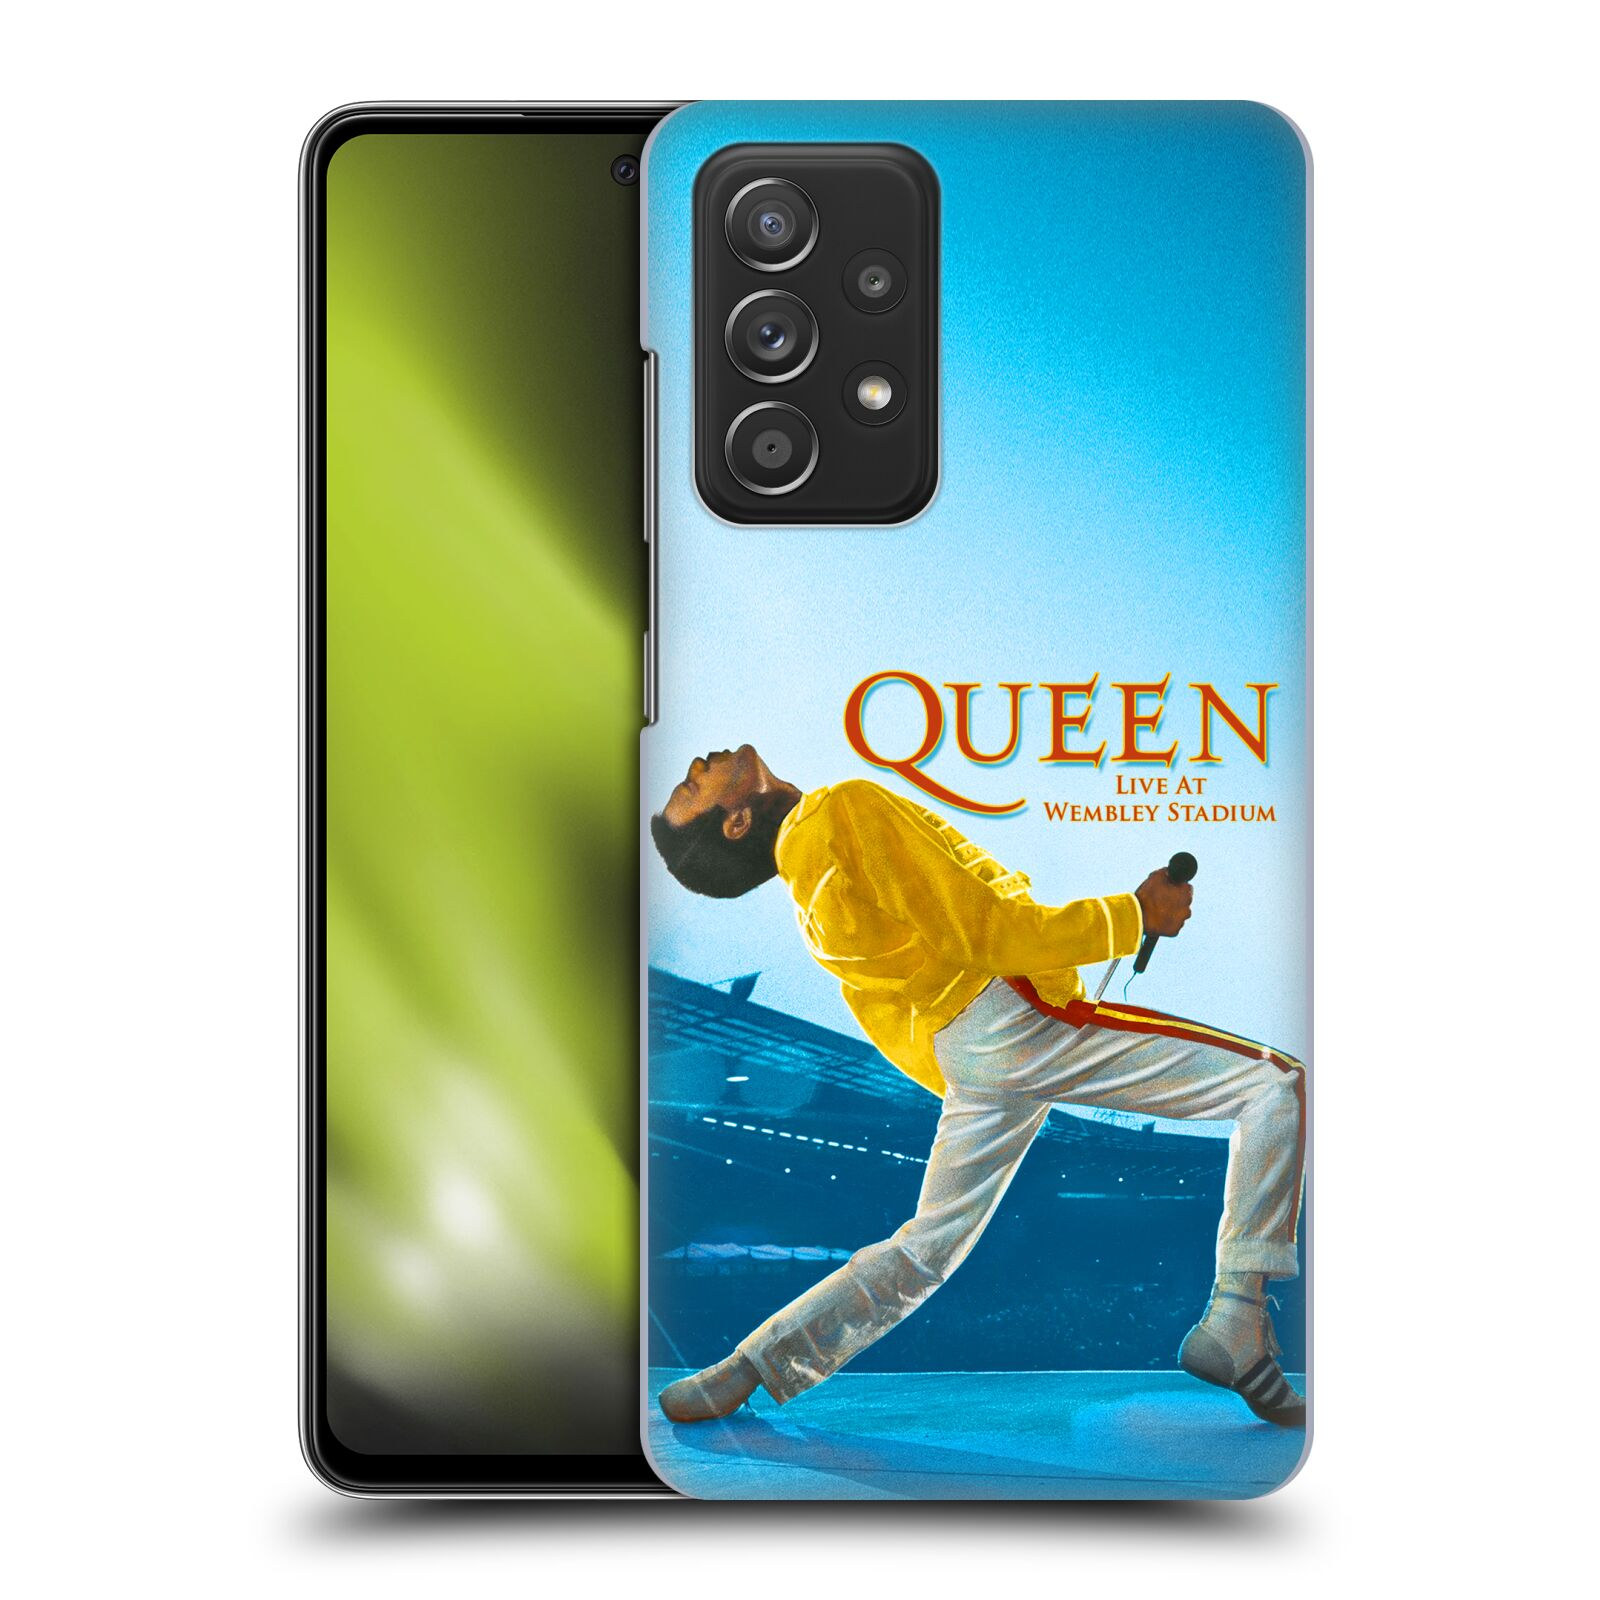 Plastové pouzdro na mobil Samsung Galaxy A52 / A52 5G / A52s 5G - Head Case - Queen - Freddie Mercury